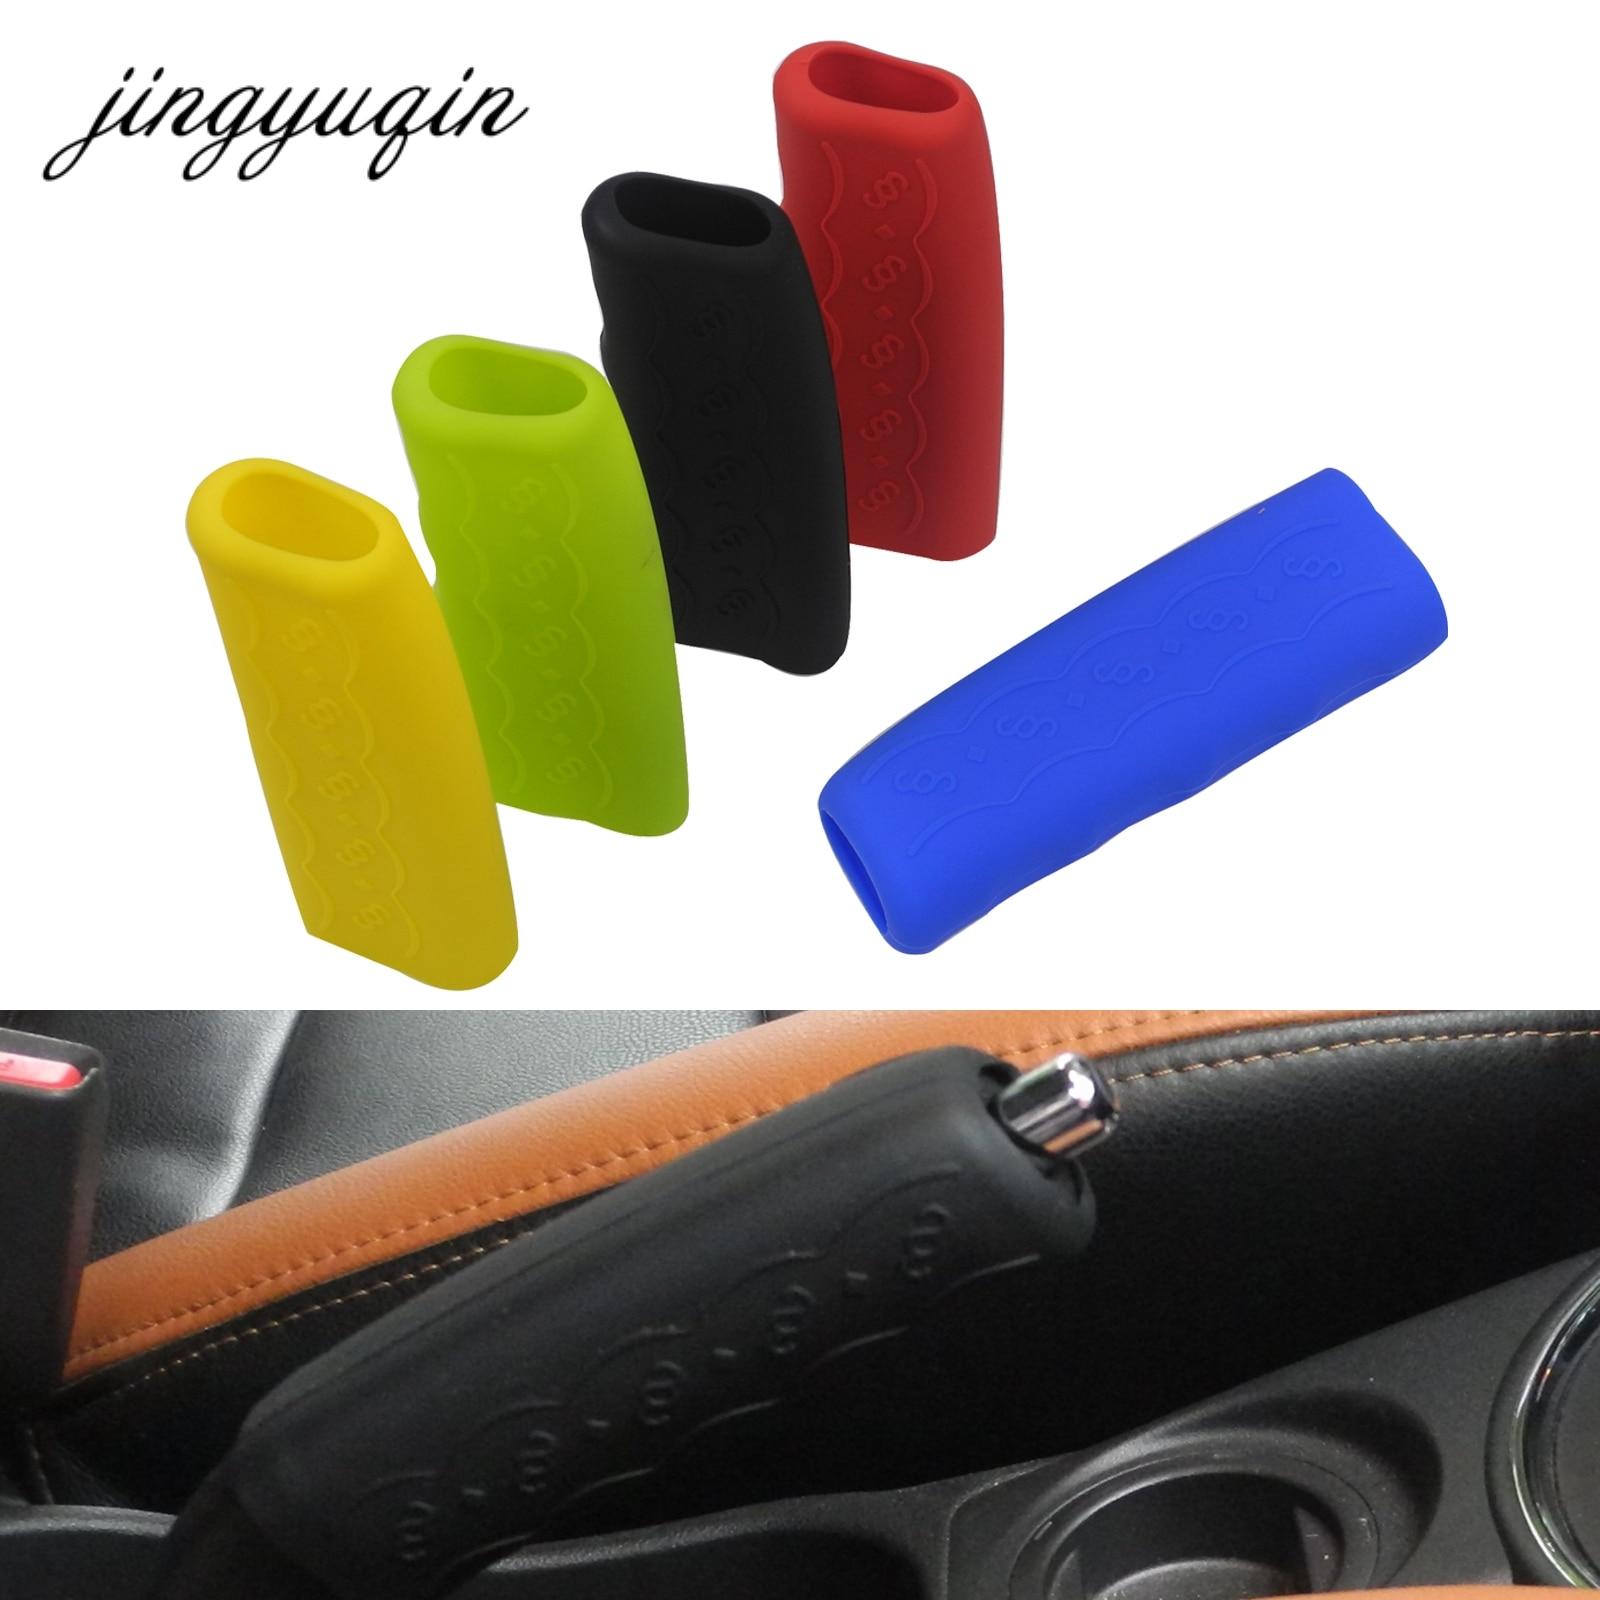 Jingyuqin 10pcs/lot Anti-slip Car Handbrake Covers Sleeve Silicone Gel Case Parking Hand Brake Grips Sleeve Universal Decoration